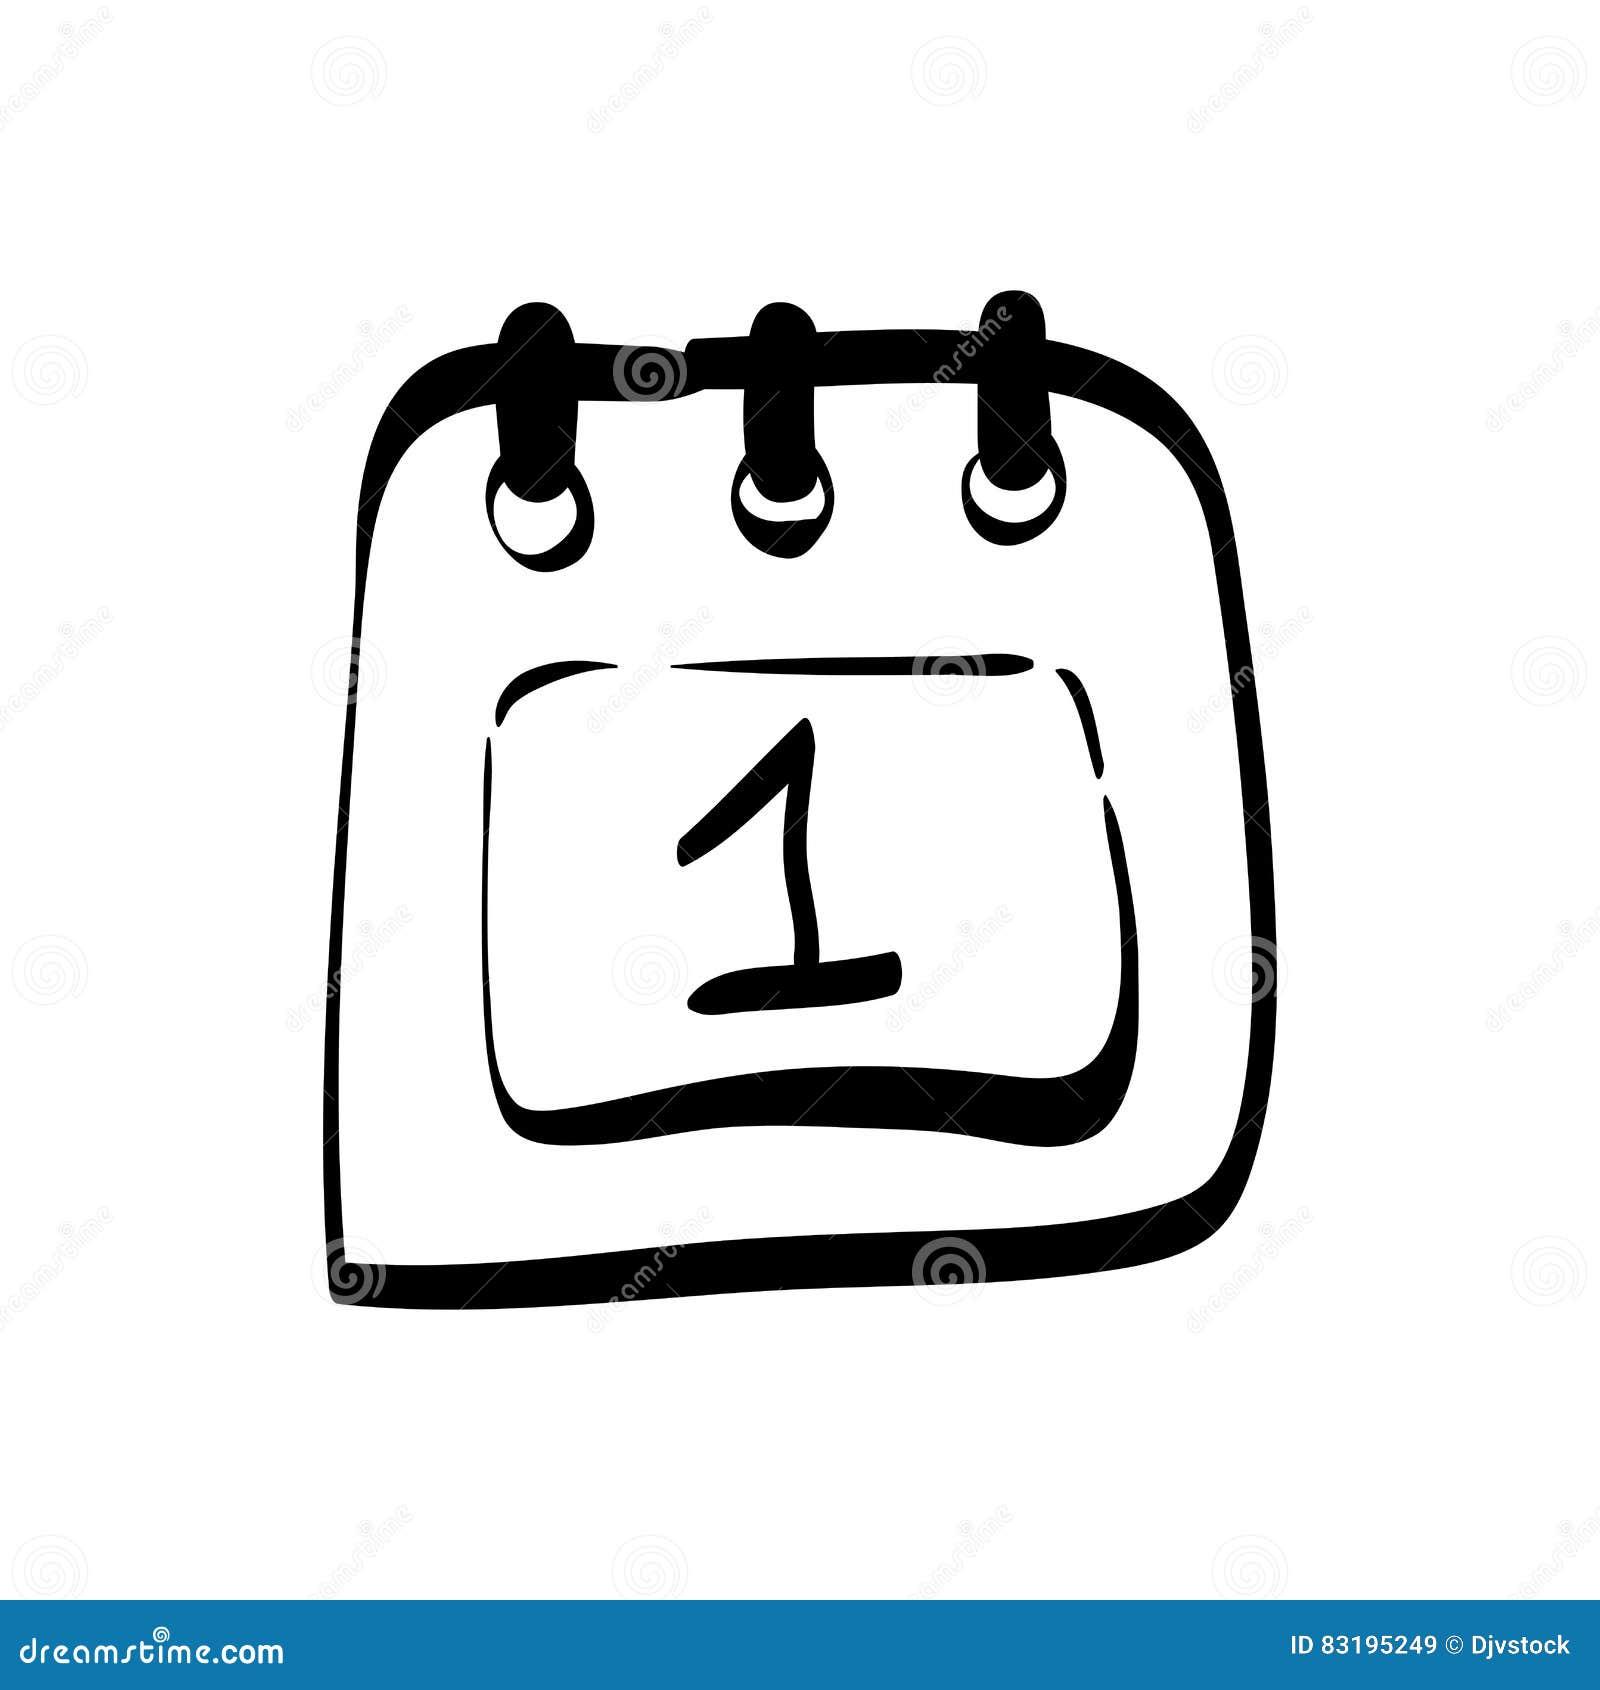 Event Calendar Illustration : Calendar event date stock illustration image